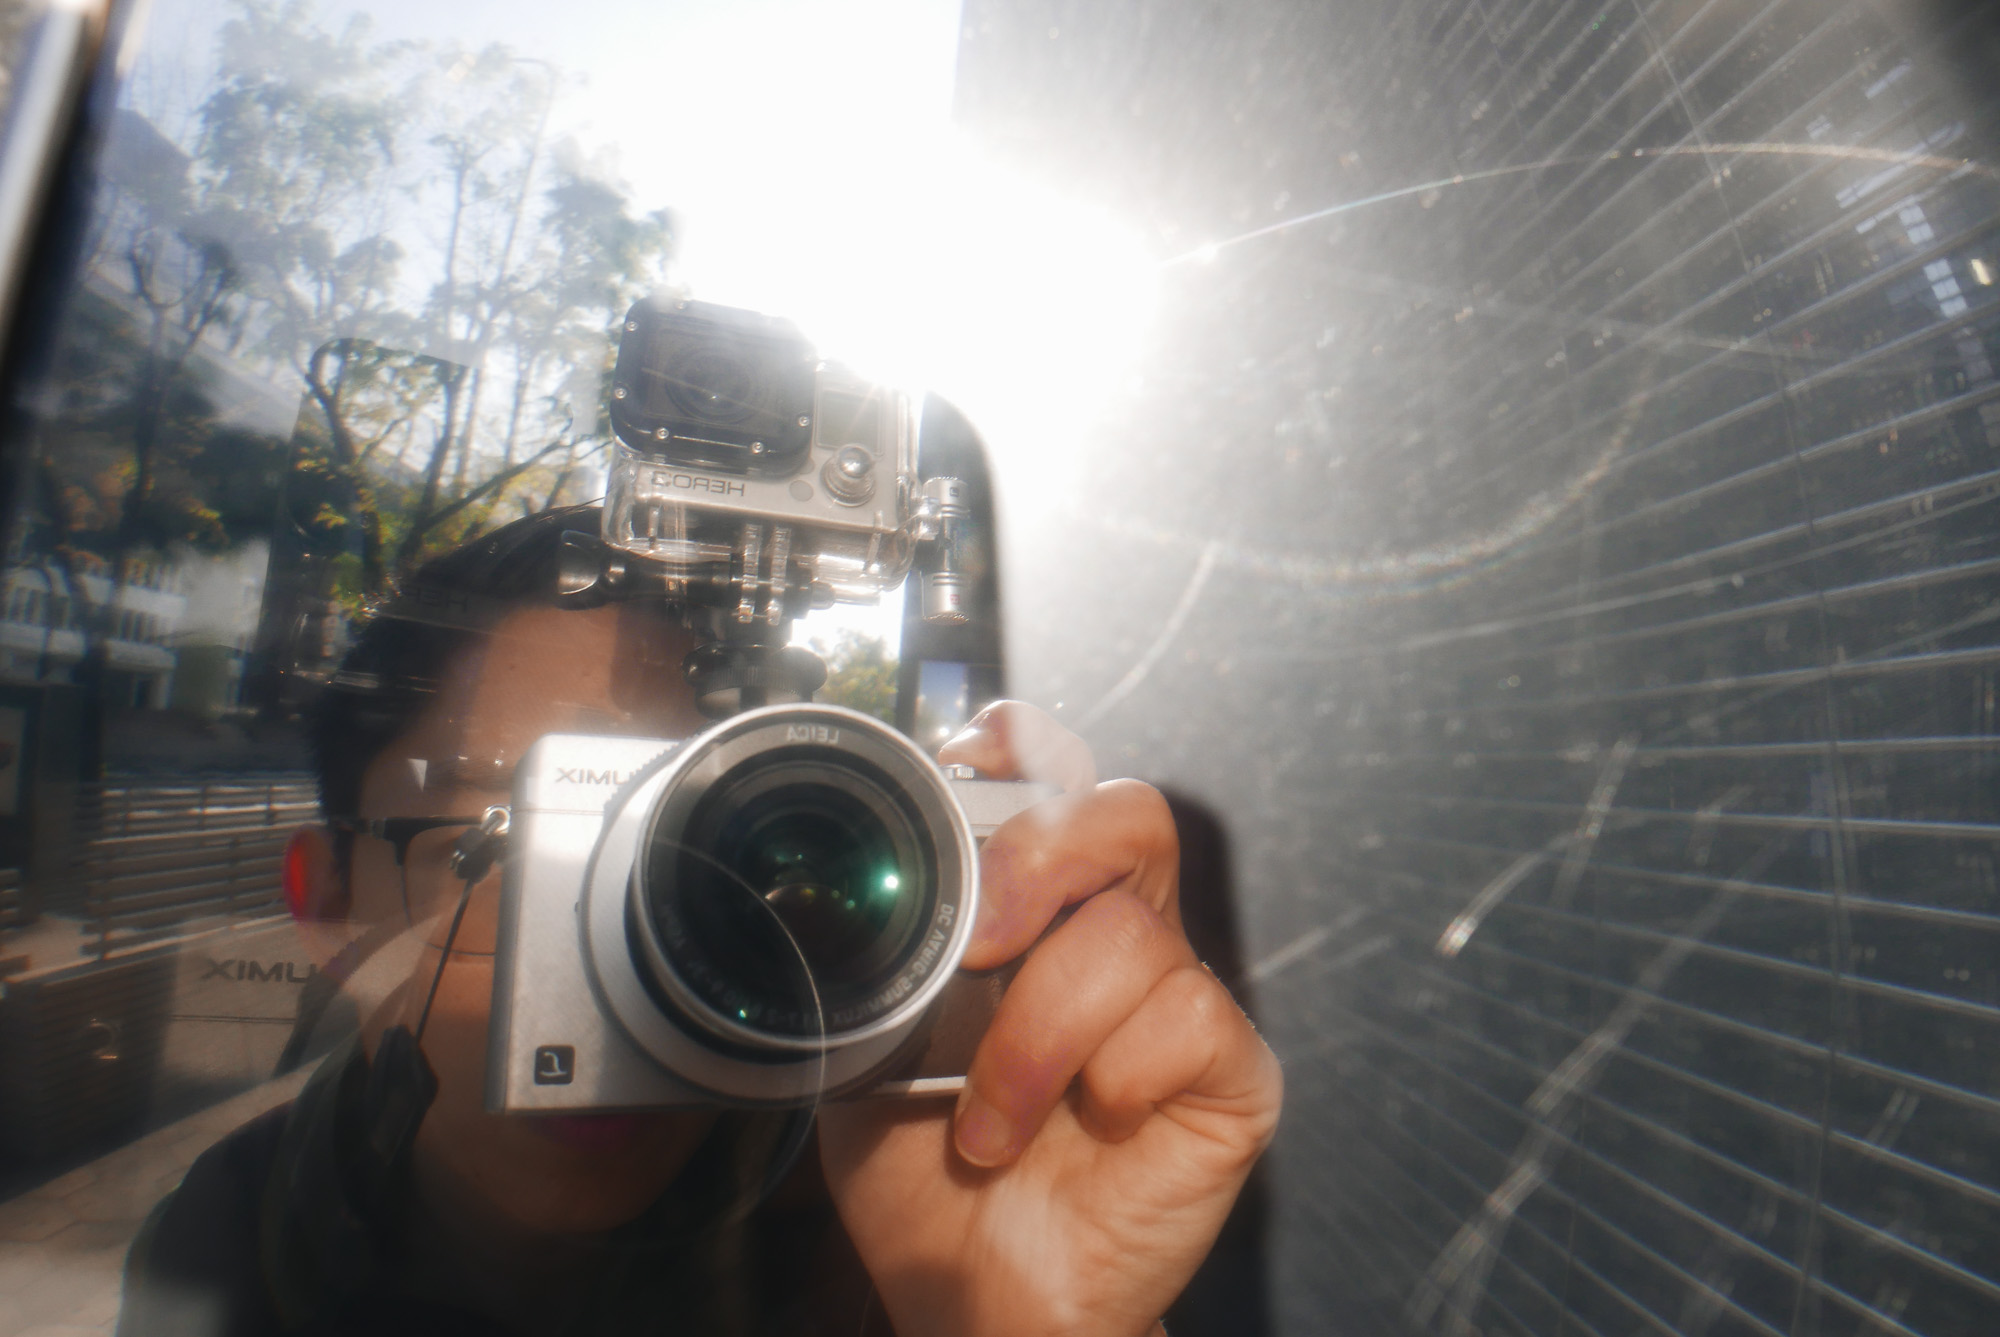 Selfie with Lumix LX100 and GoPro mounted. Osaka, 2018